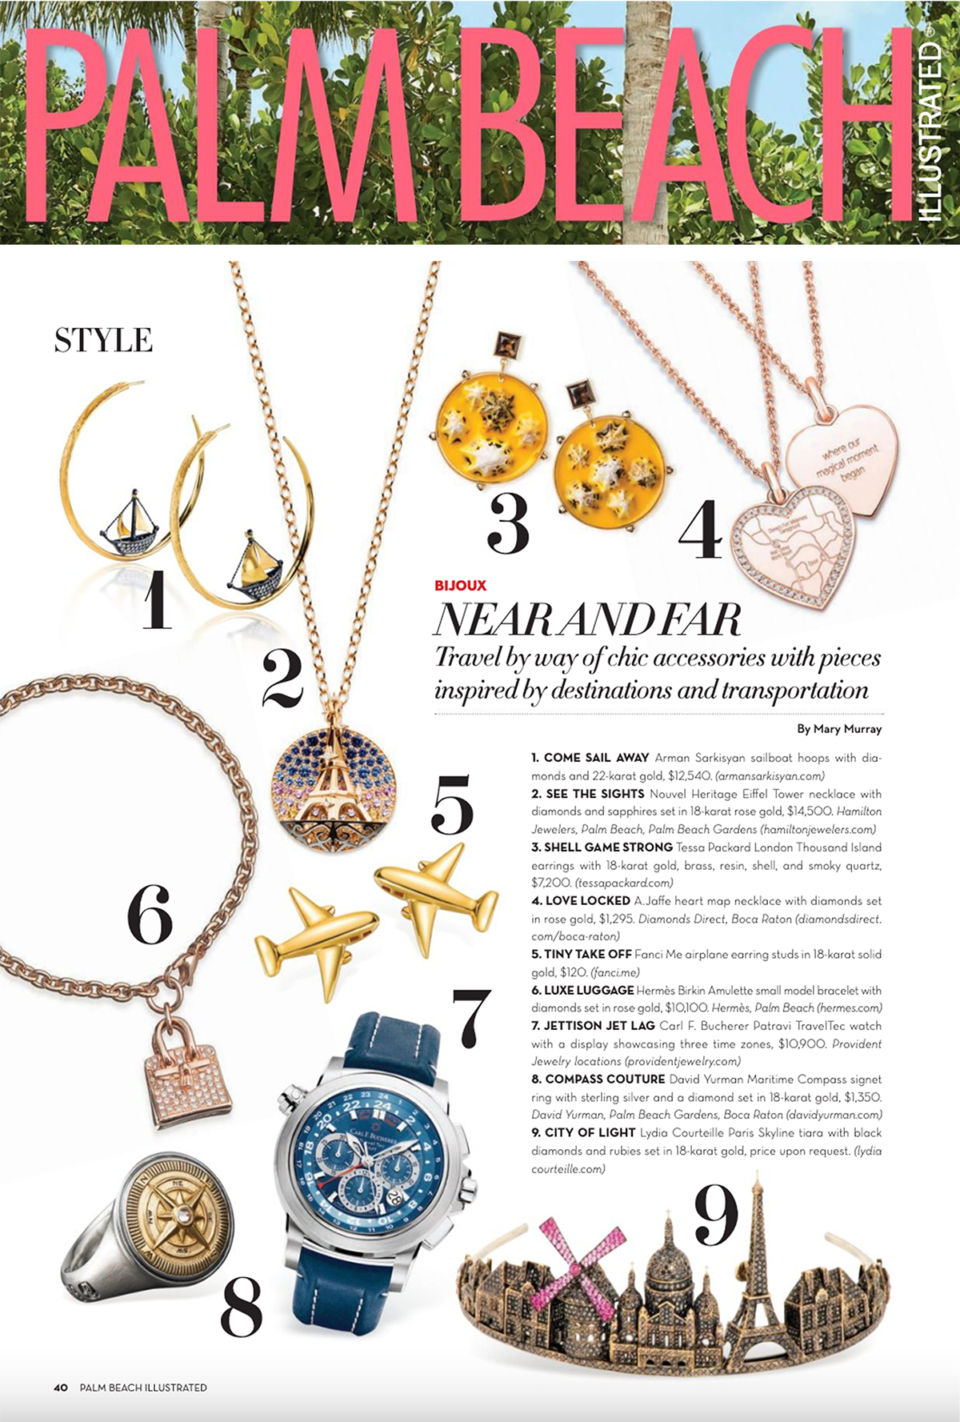 tessa packard jewelry featured in palm beach magazine